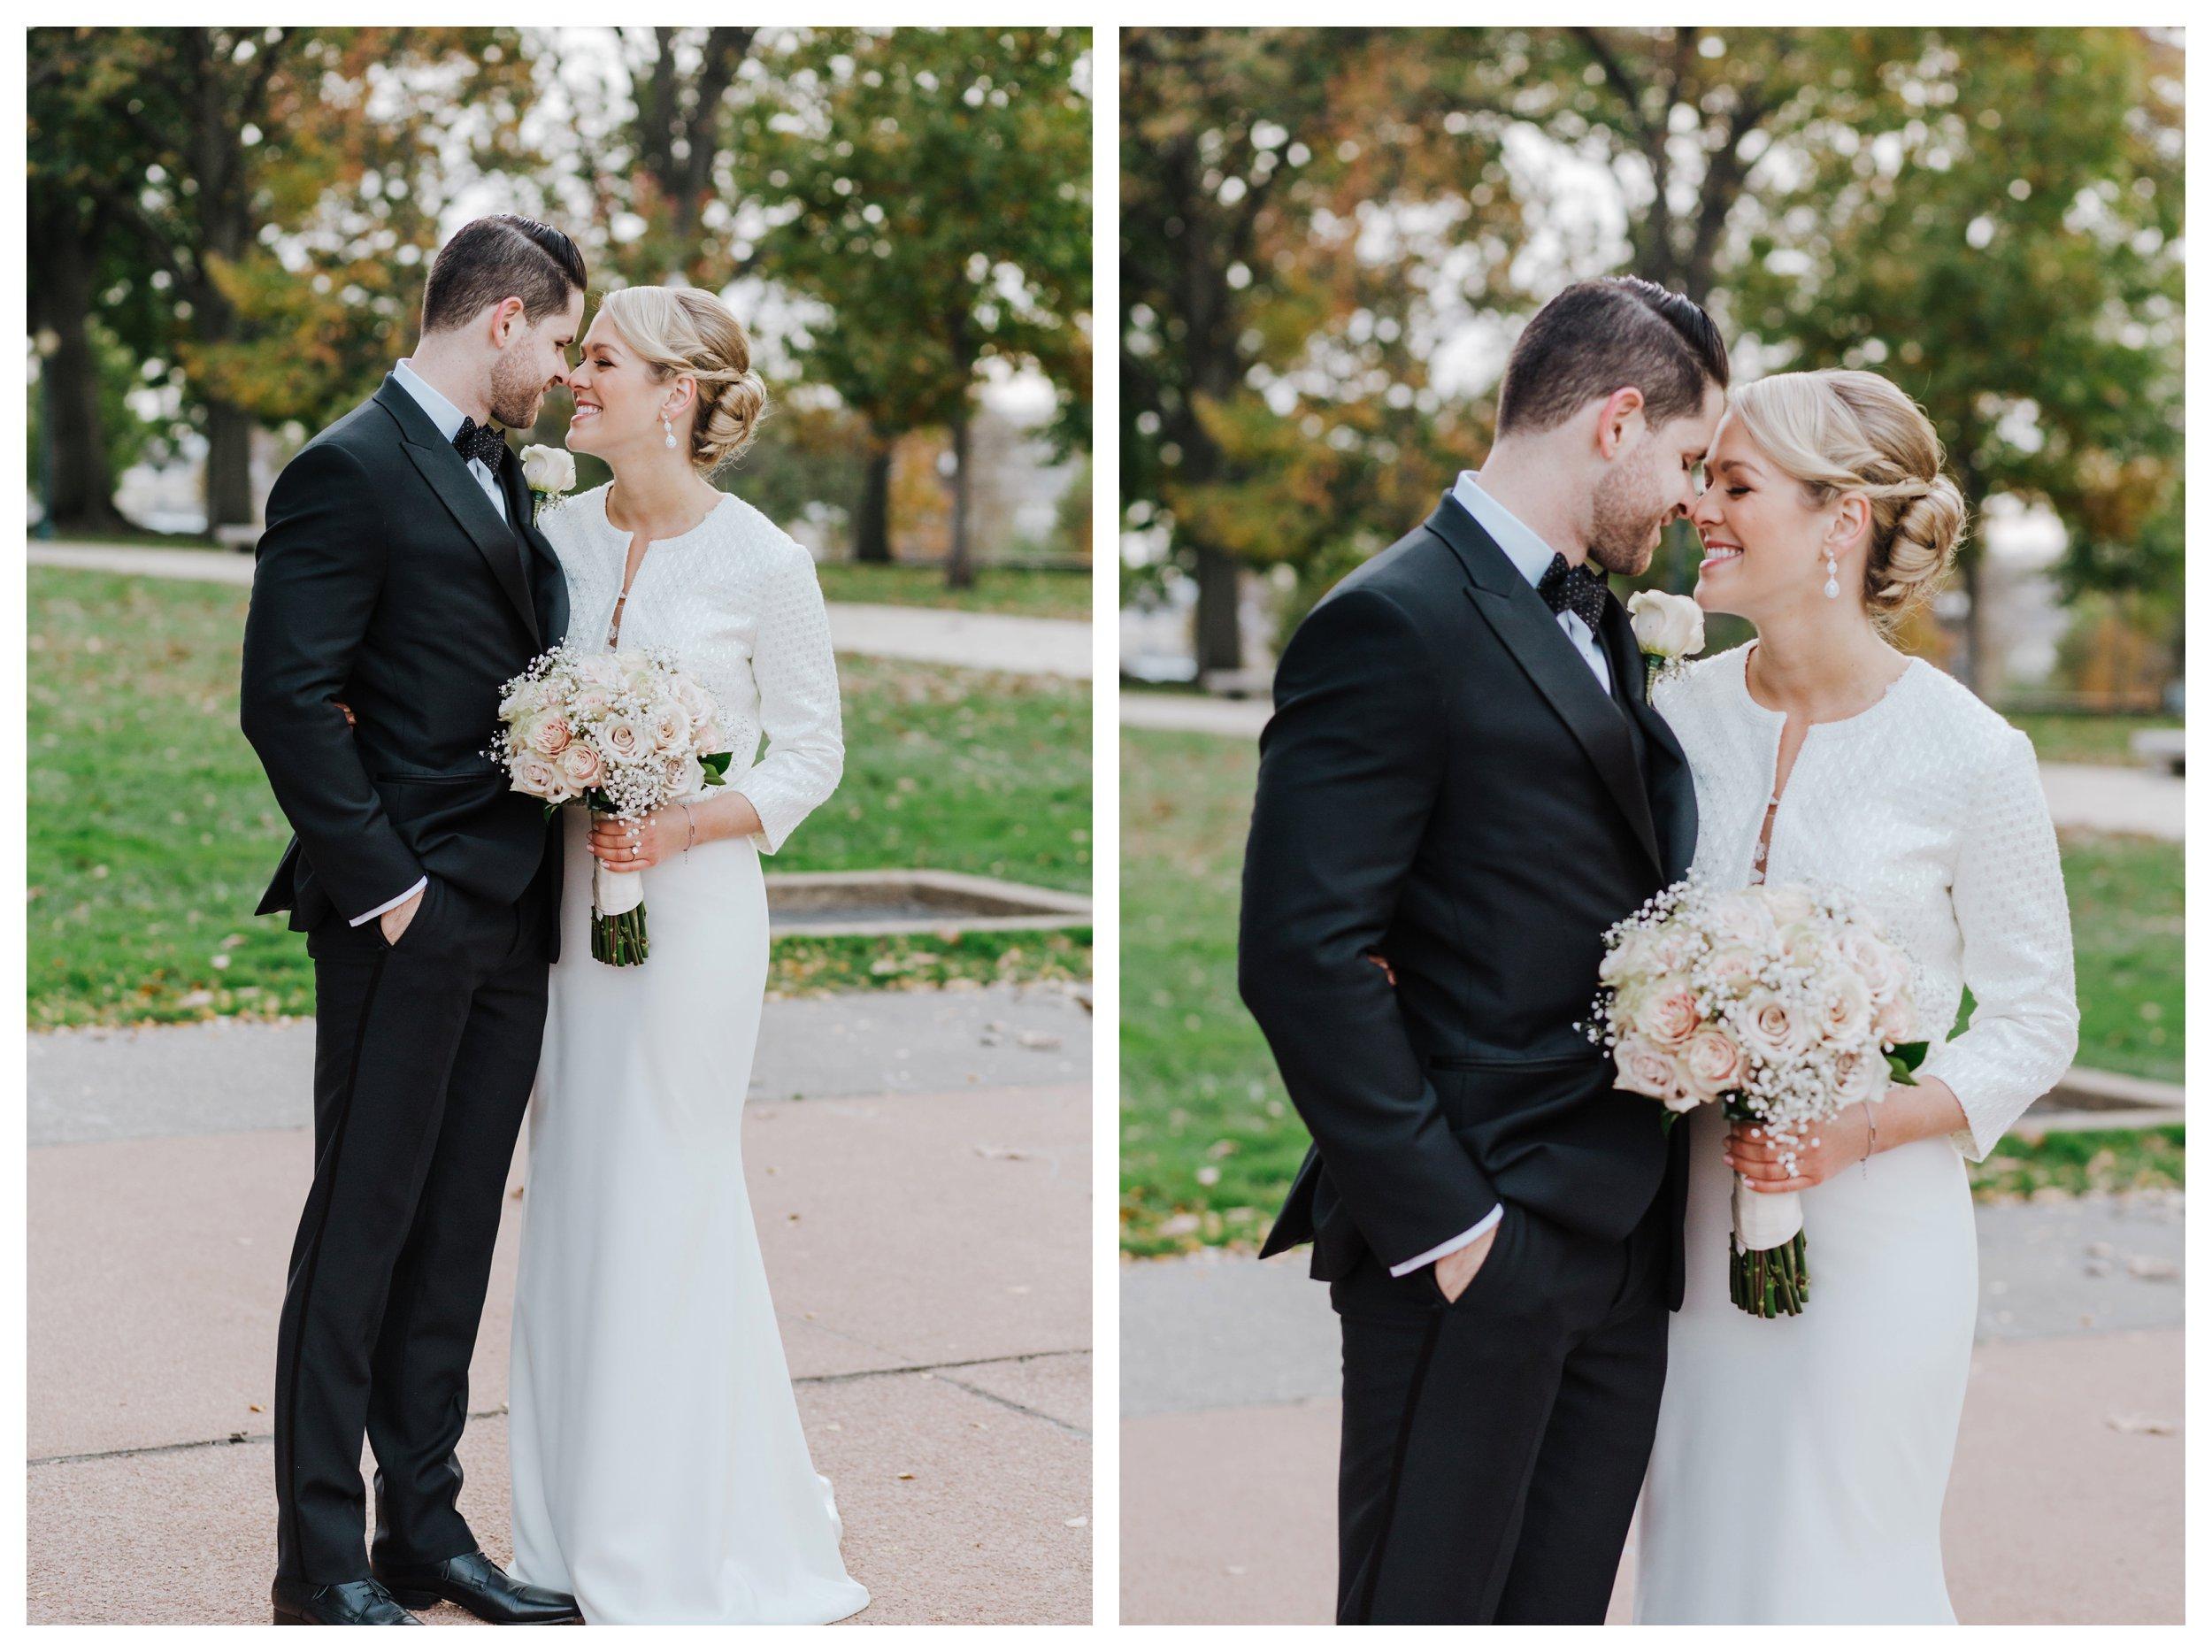 washington-dc-wedding-photographer-31.JPG